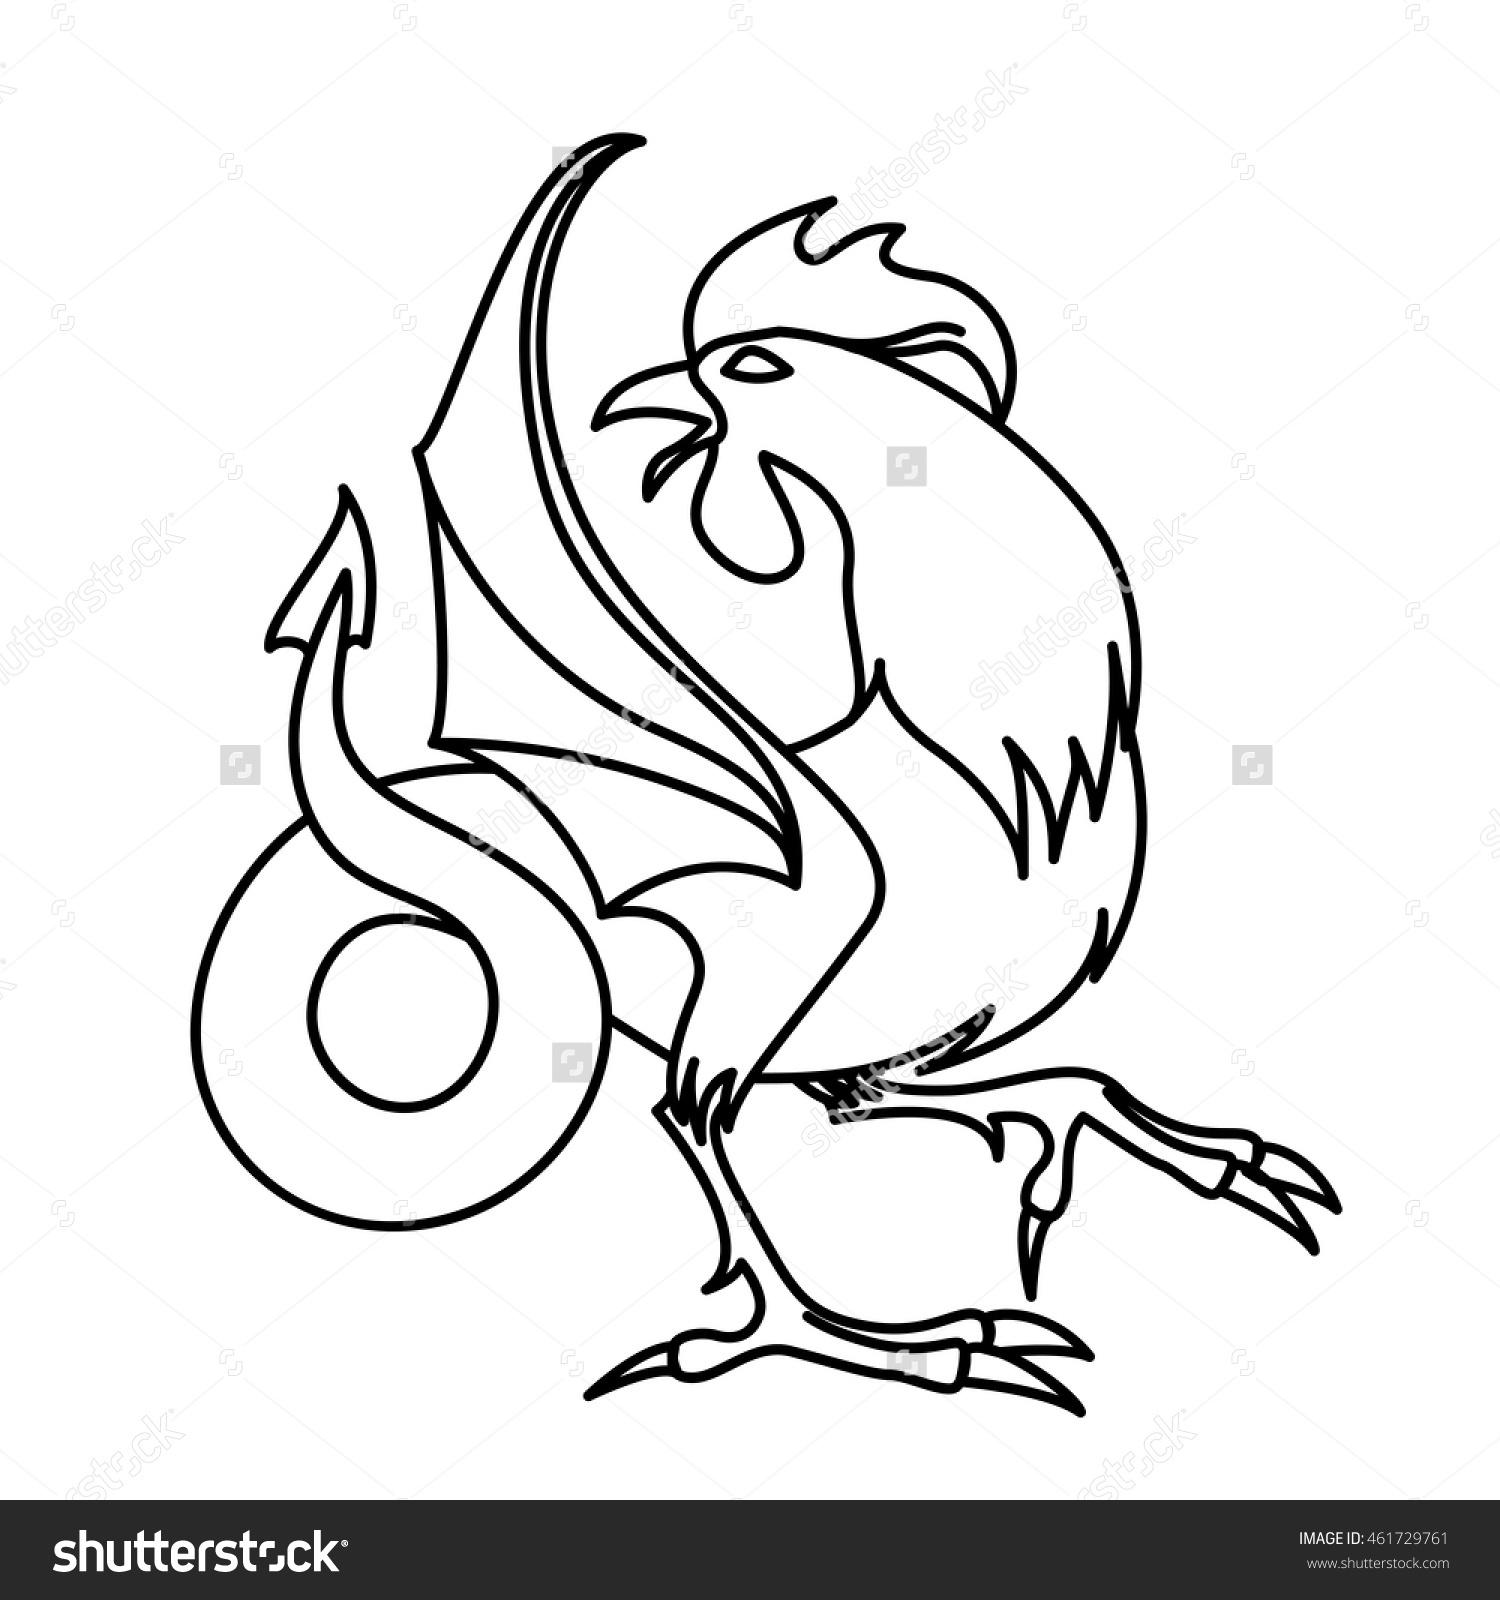 Cockatrice coloring #6, Download drawings